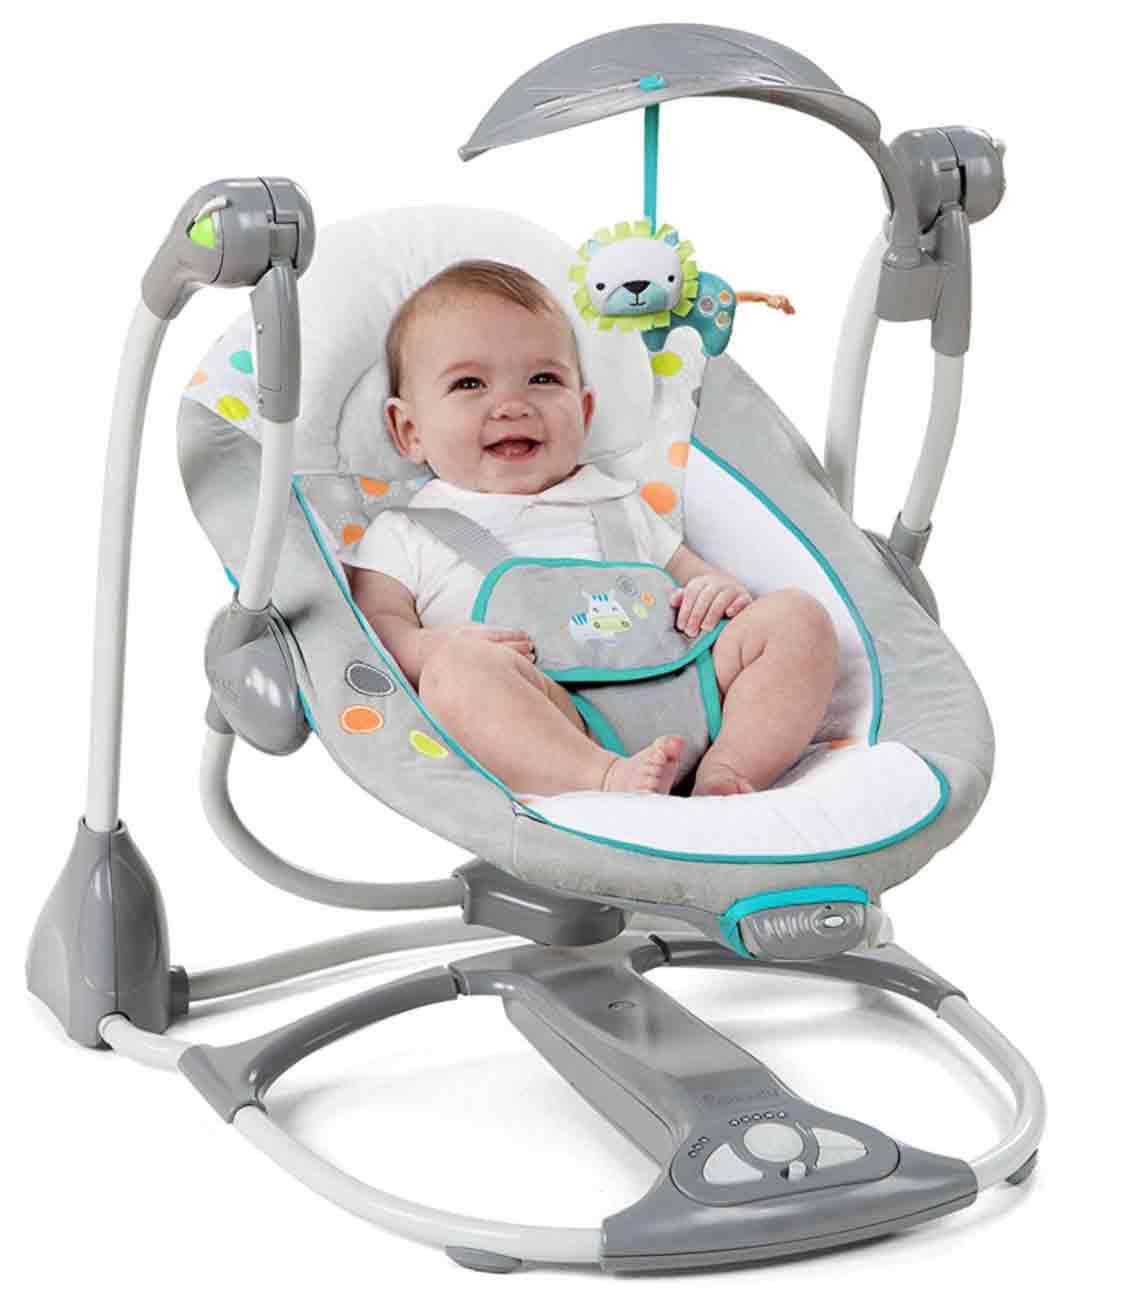 Ingenuity-ConvertMe-Swing-2-Seat-Portable-Swing Ridgedale